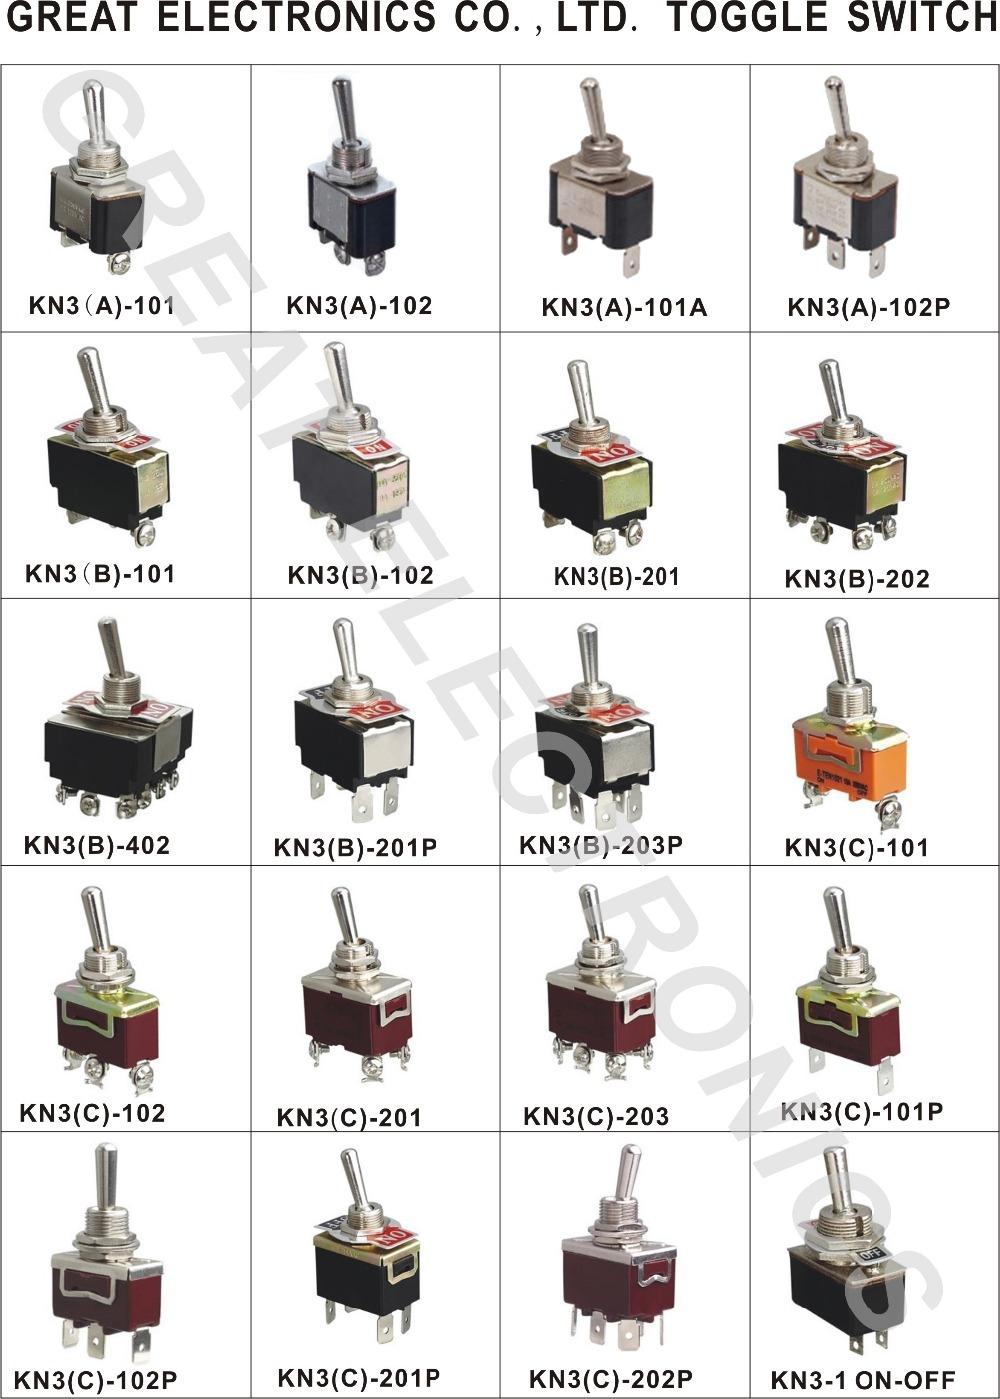 4pdt 12pins 3a 250vac6a 125vac3 Way Mini Toggle Switch Buy 3 1